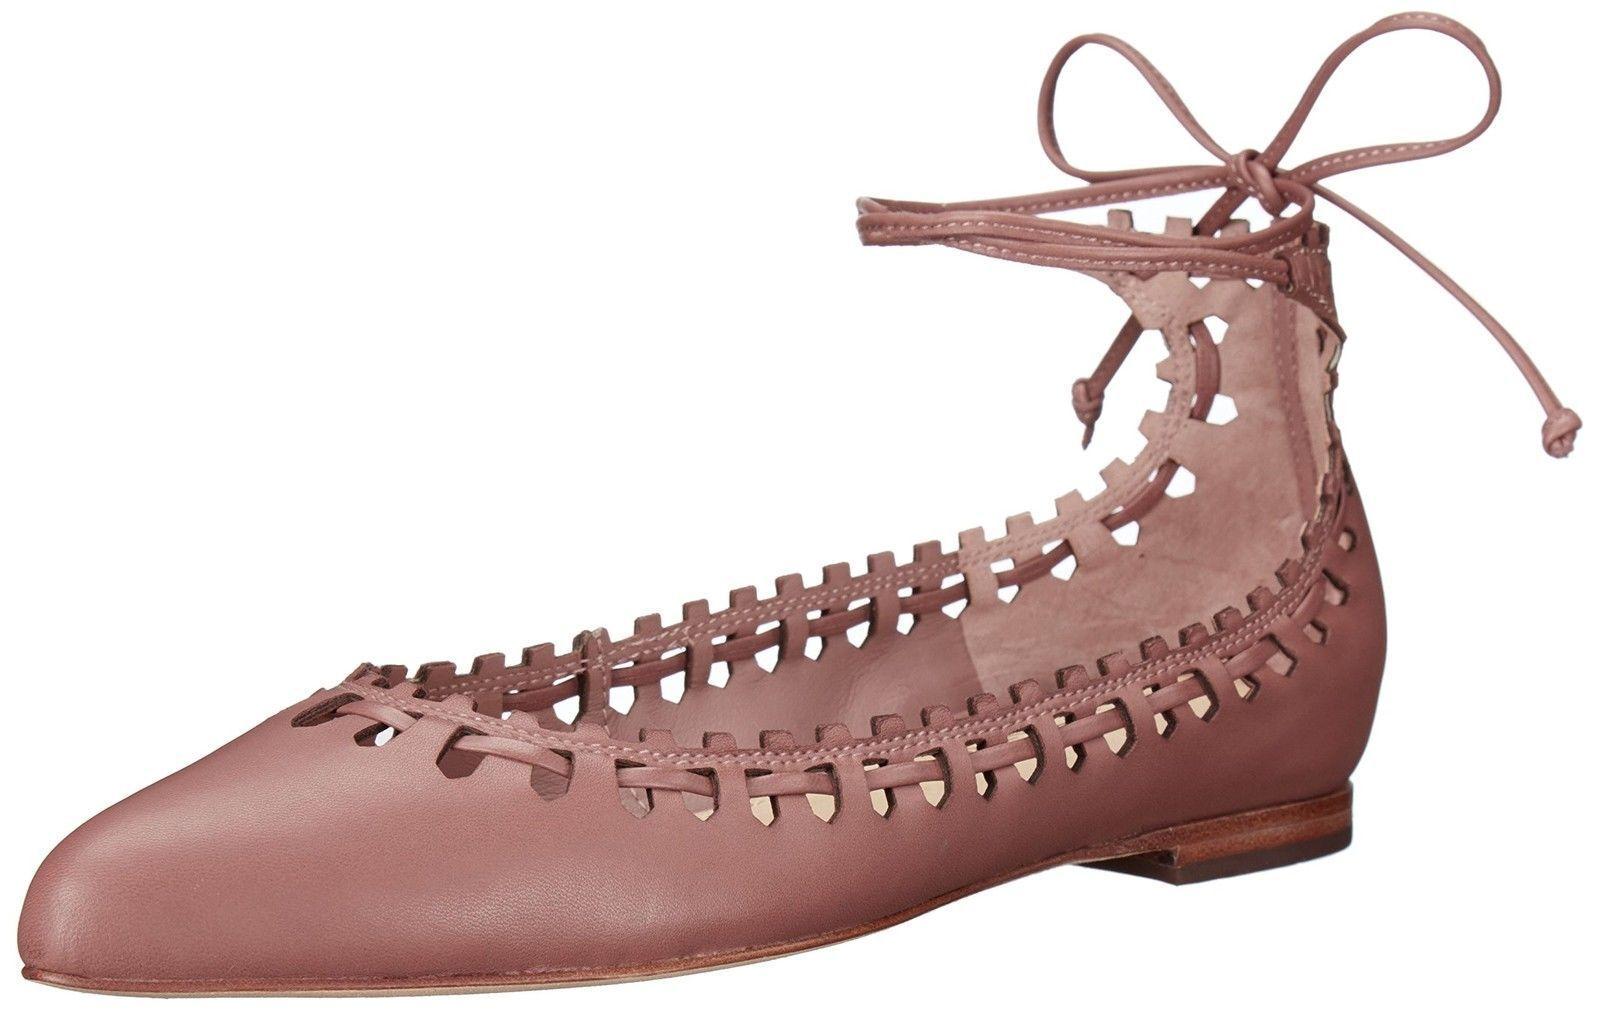 $195 size 9 Via Spiga Sammy Rose Leather Ballet Flats Ankle Strap Womens Shoes